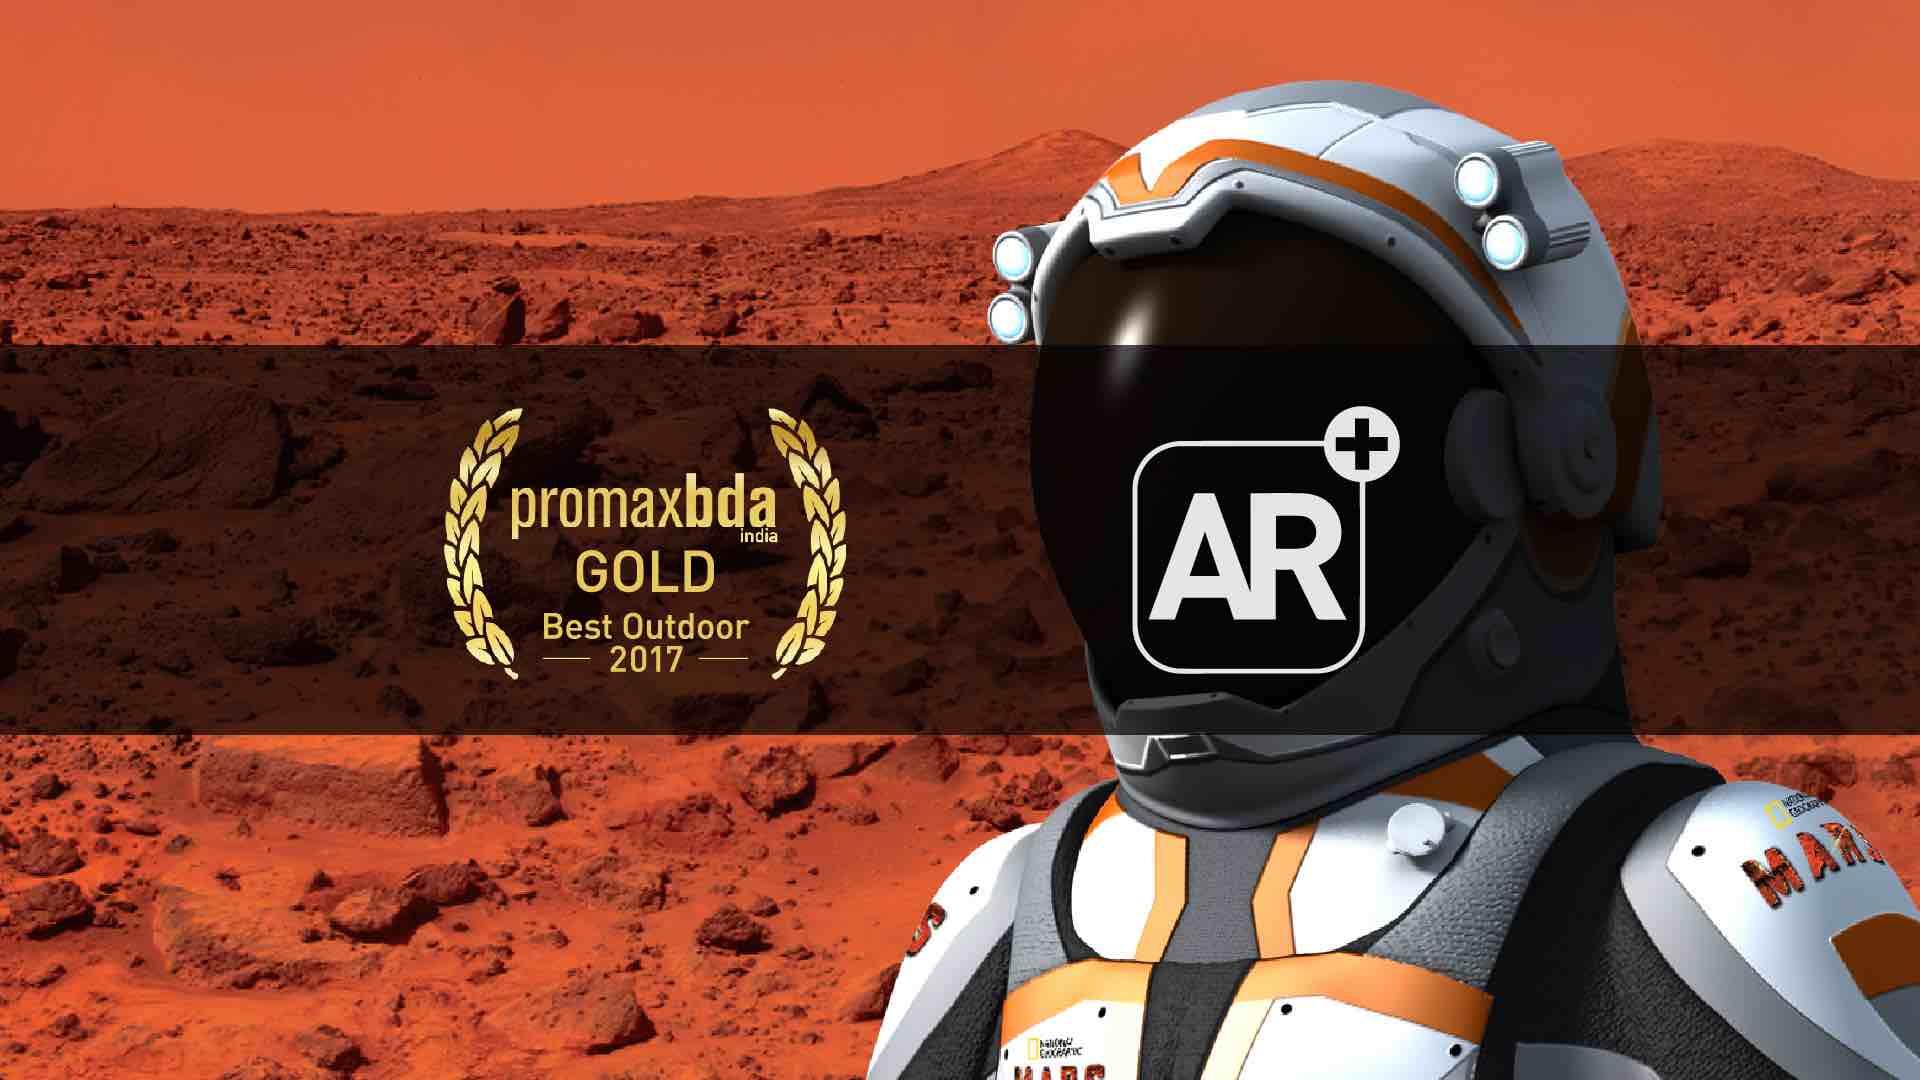 NGC – Mars – AR | PromaxBDA India 2017 Gold – Best Outdoor